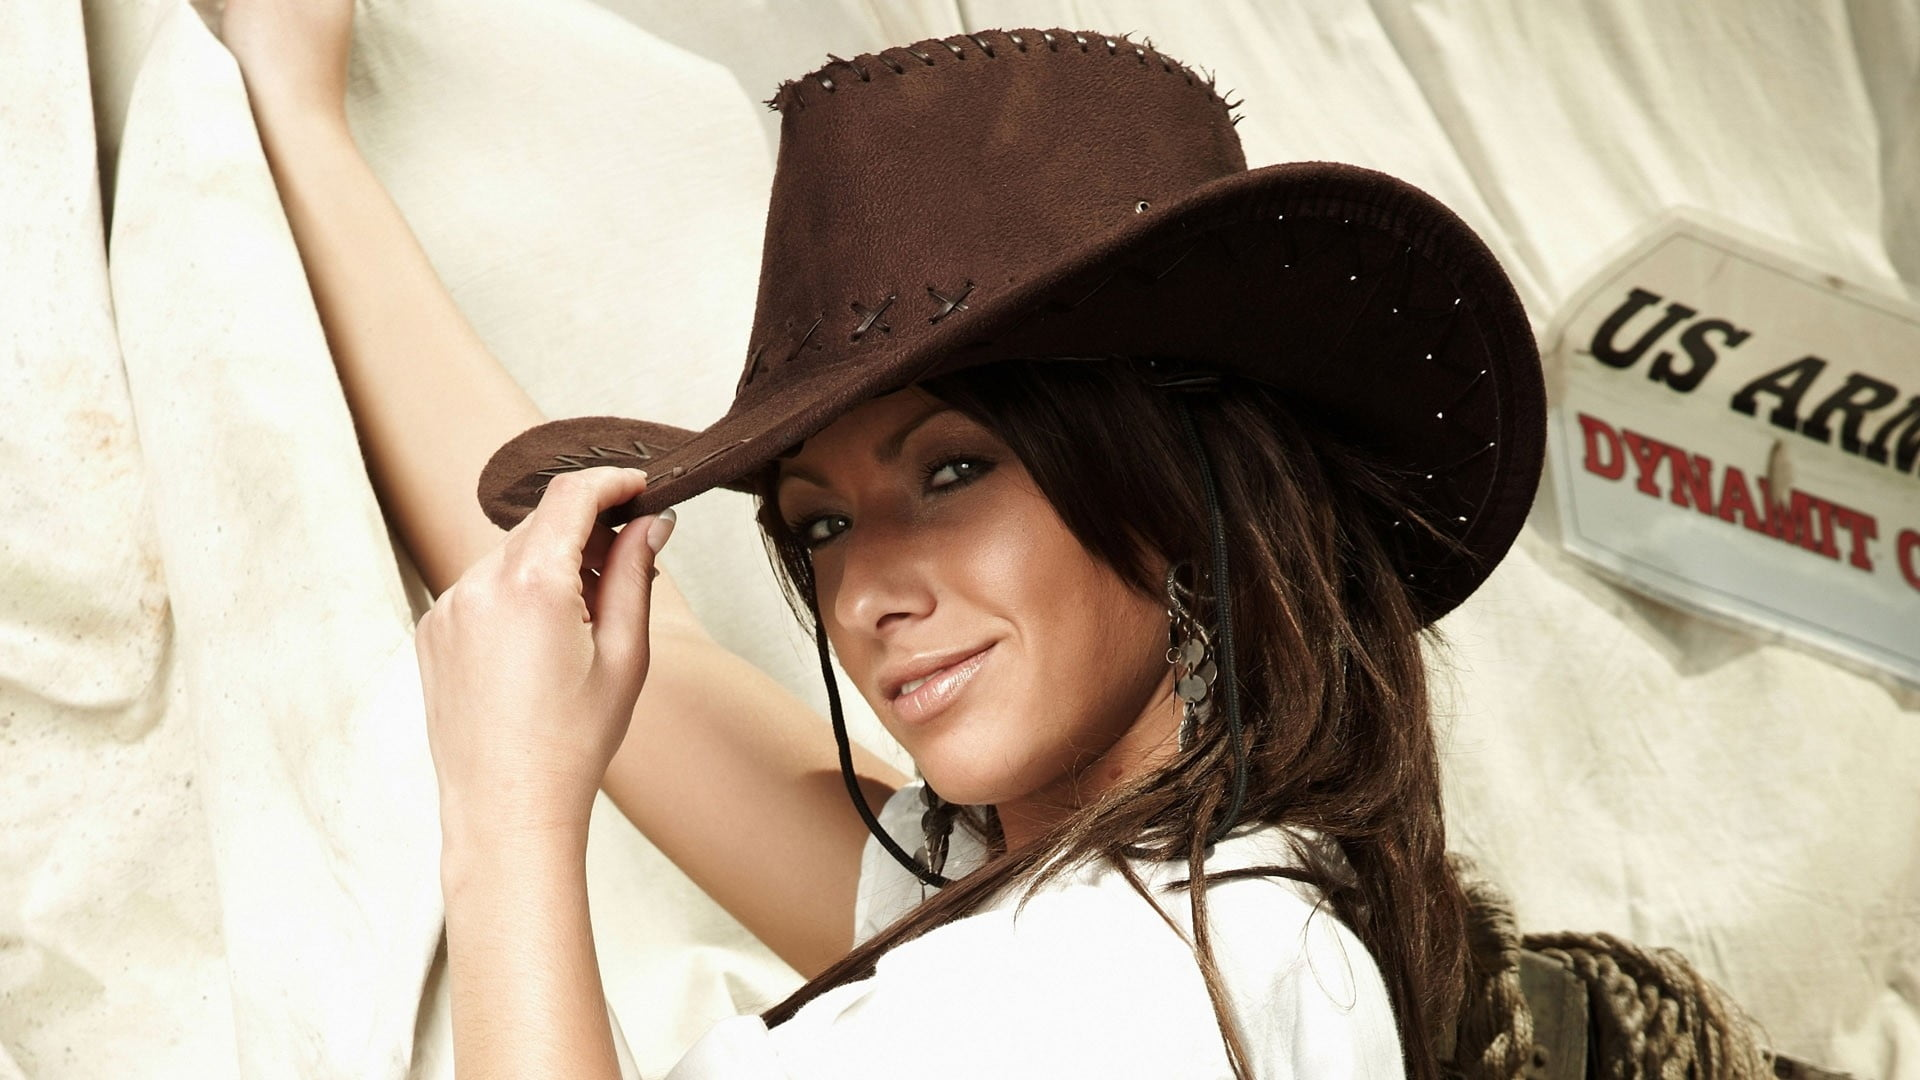 Woman wearing a brown cowboy hat HD wallpaper | Wallpaper Flare